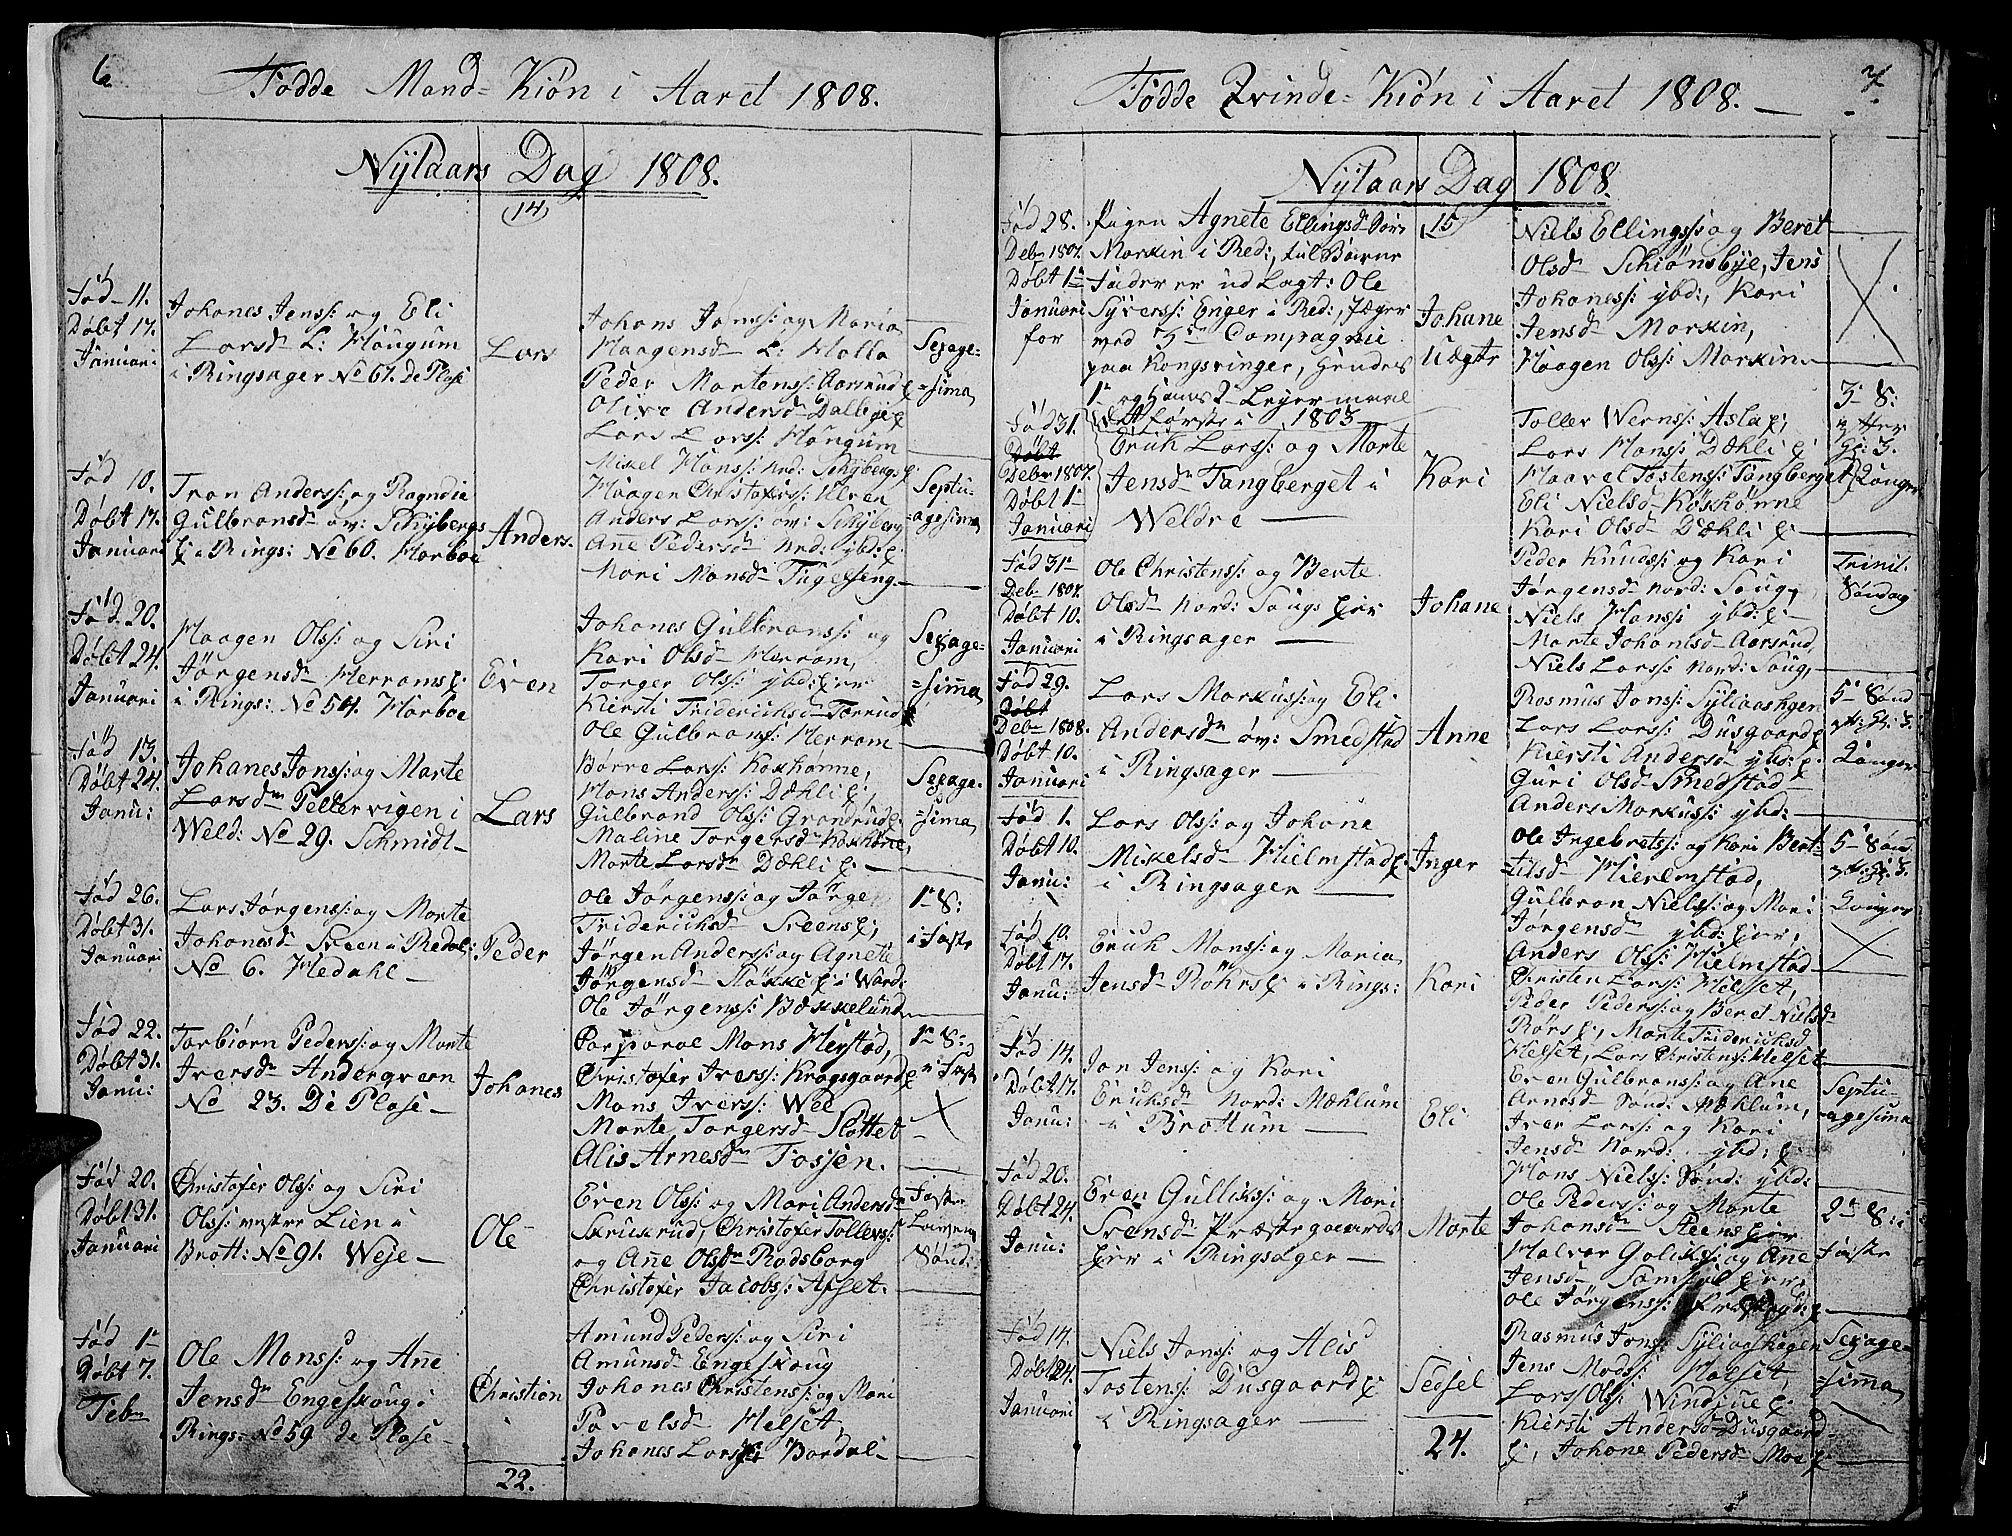 SAH, Ringsaker prestekontor, I/Ia/L0005/0008: Kladd til kirkebok nr. 1H, 1807-1811, s. 6-7